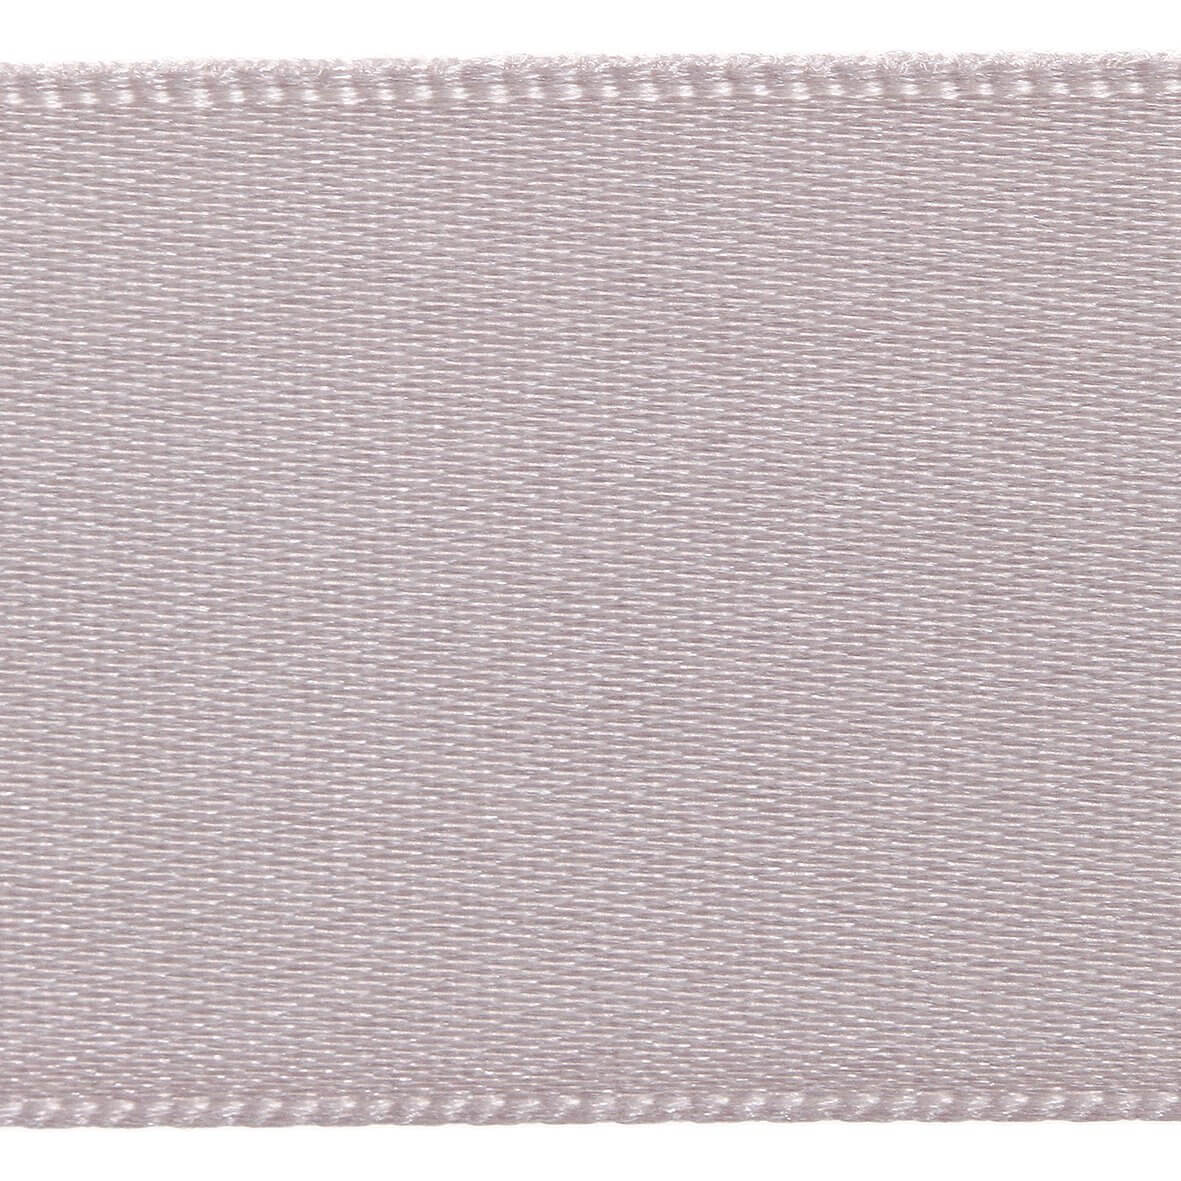 15mm Berisfords Satin Ribbon - Silver Grey Colour 18